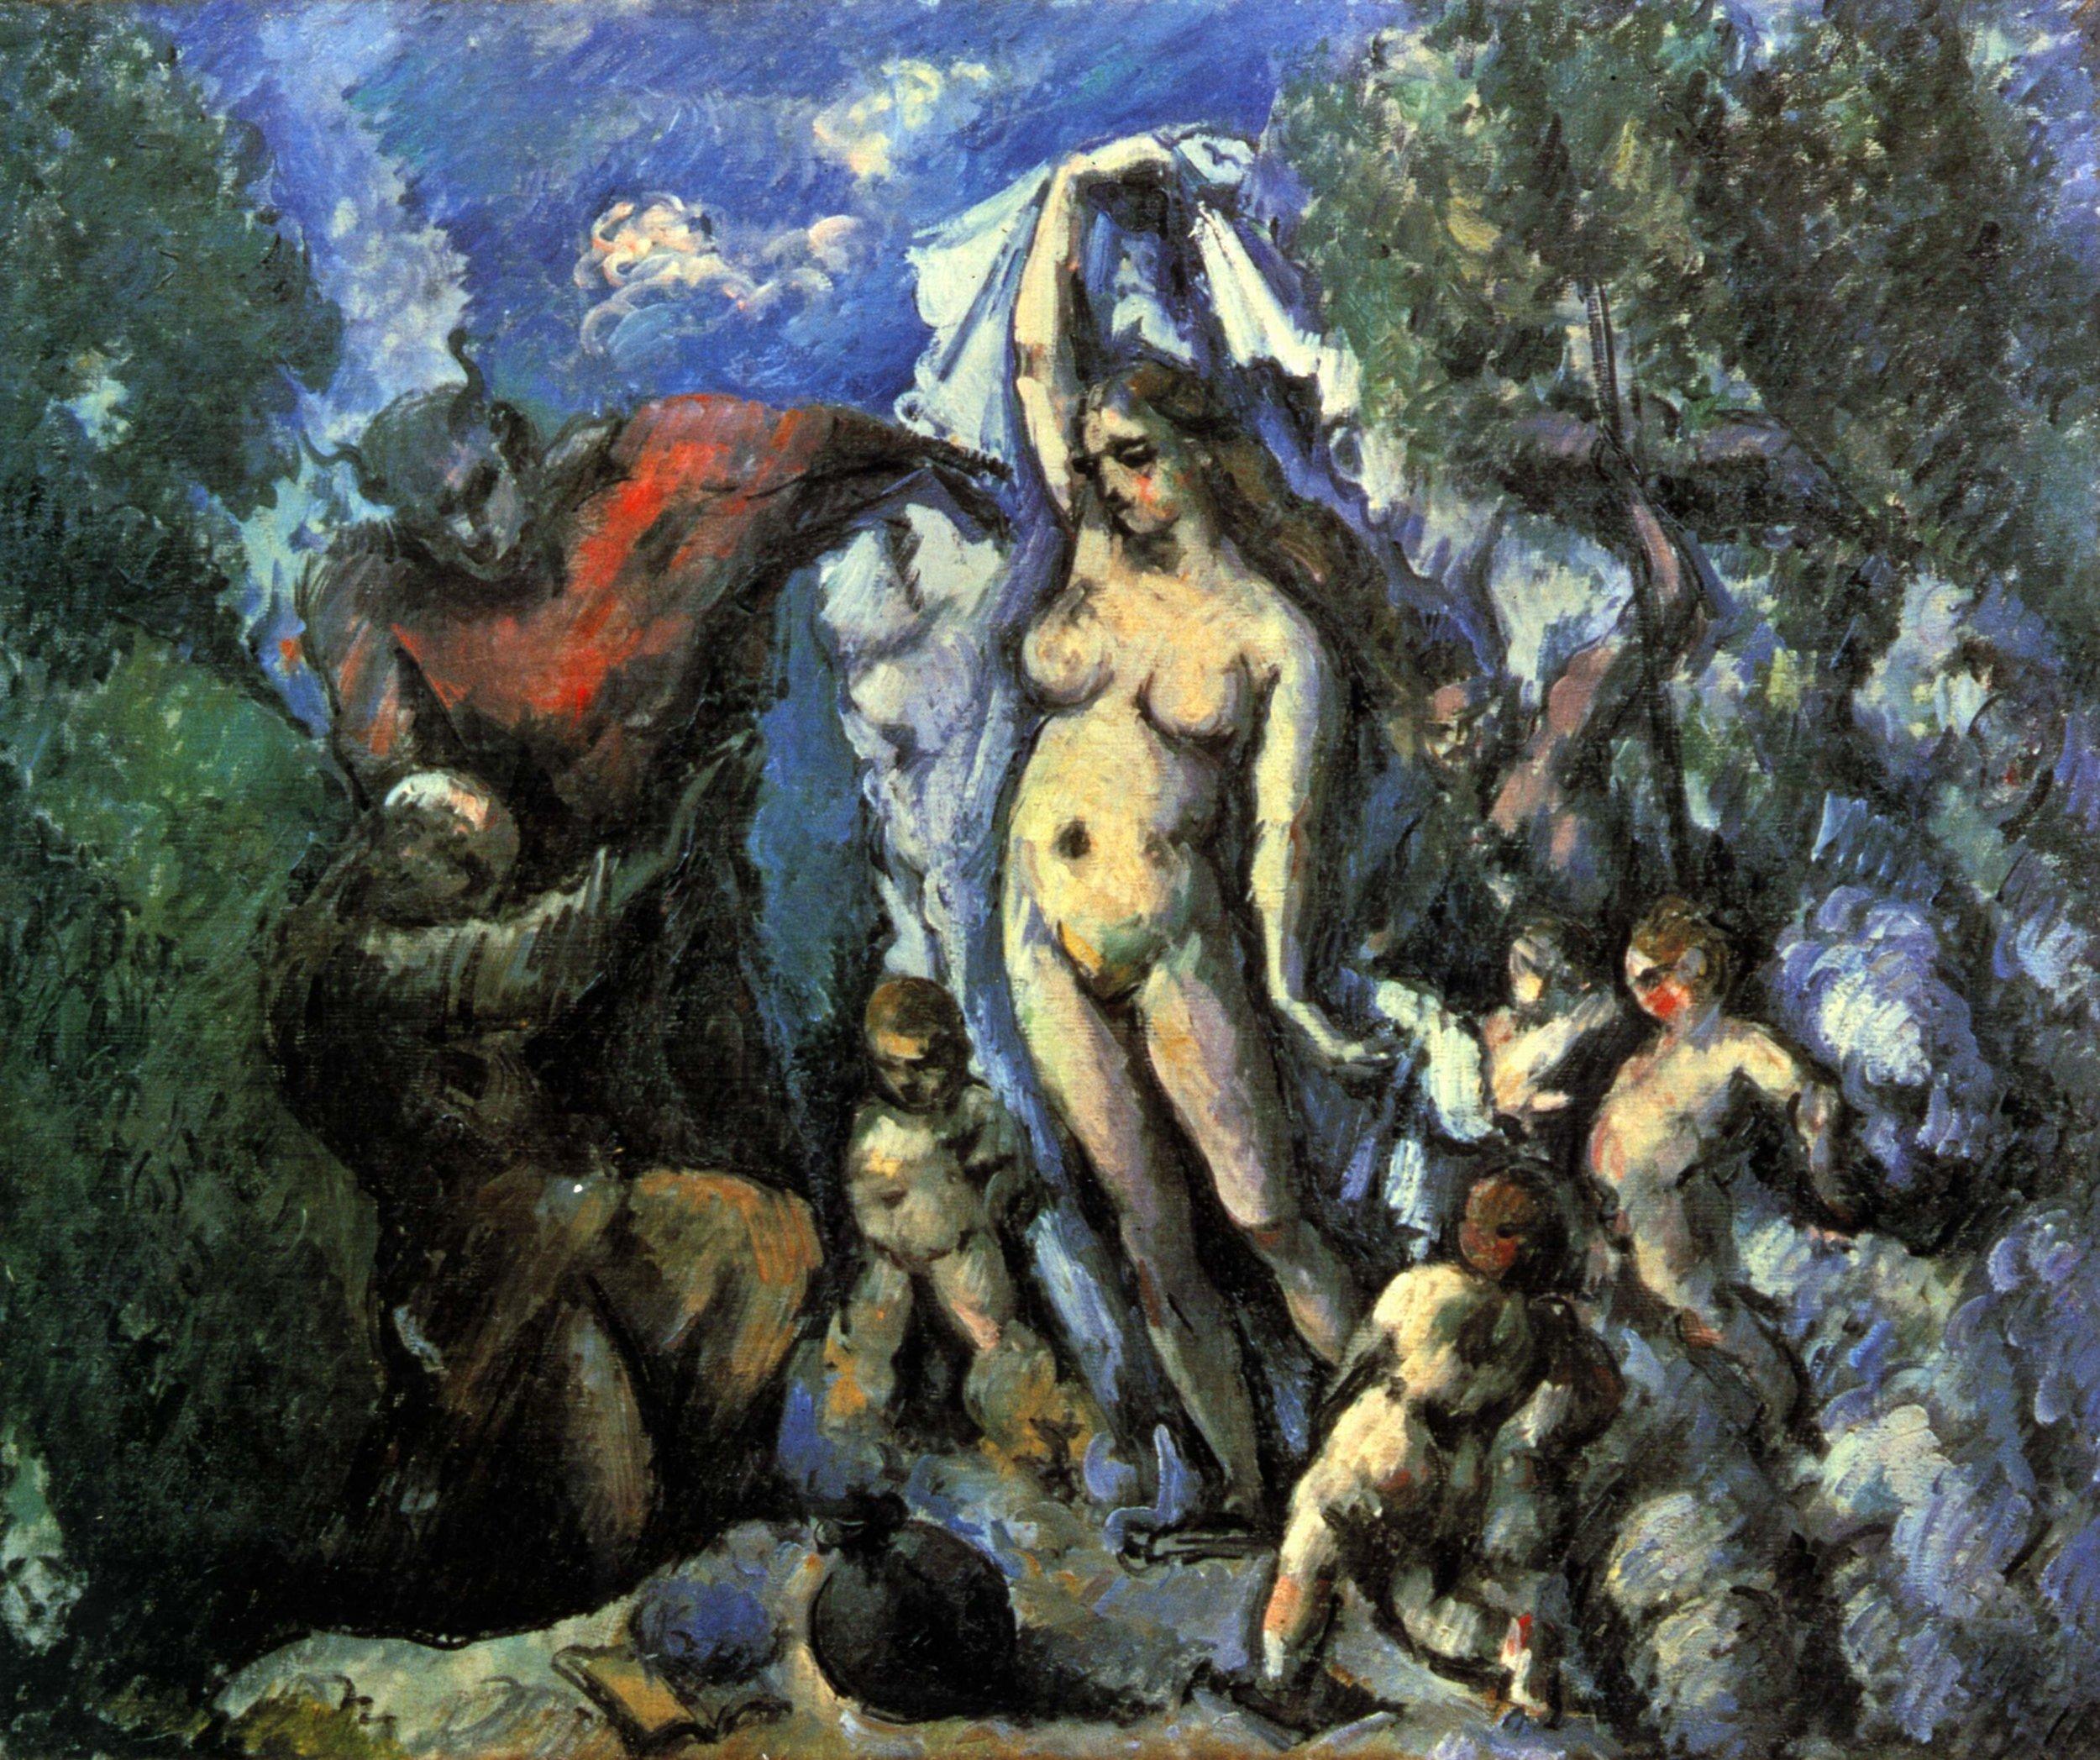 Paul Cézanne (1839-1906),  The Temptation of St. Anthony  (1877), oil on canvas, 47 x 56 cm.Musée d'Orsay, Paris. Wikimedia Commons.